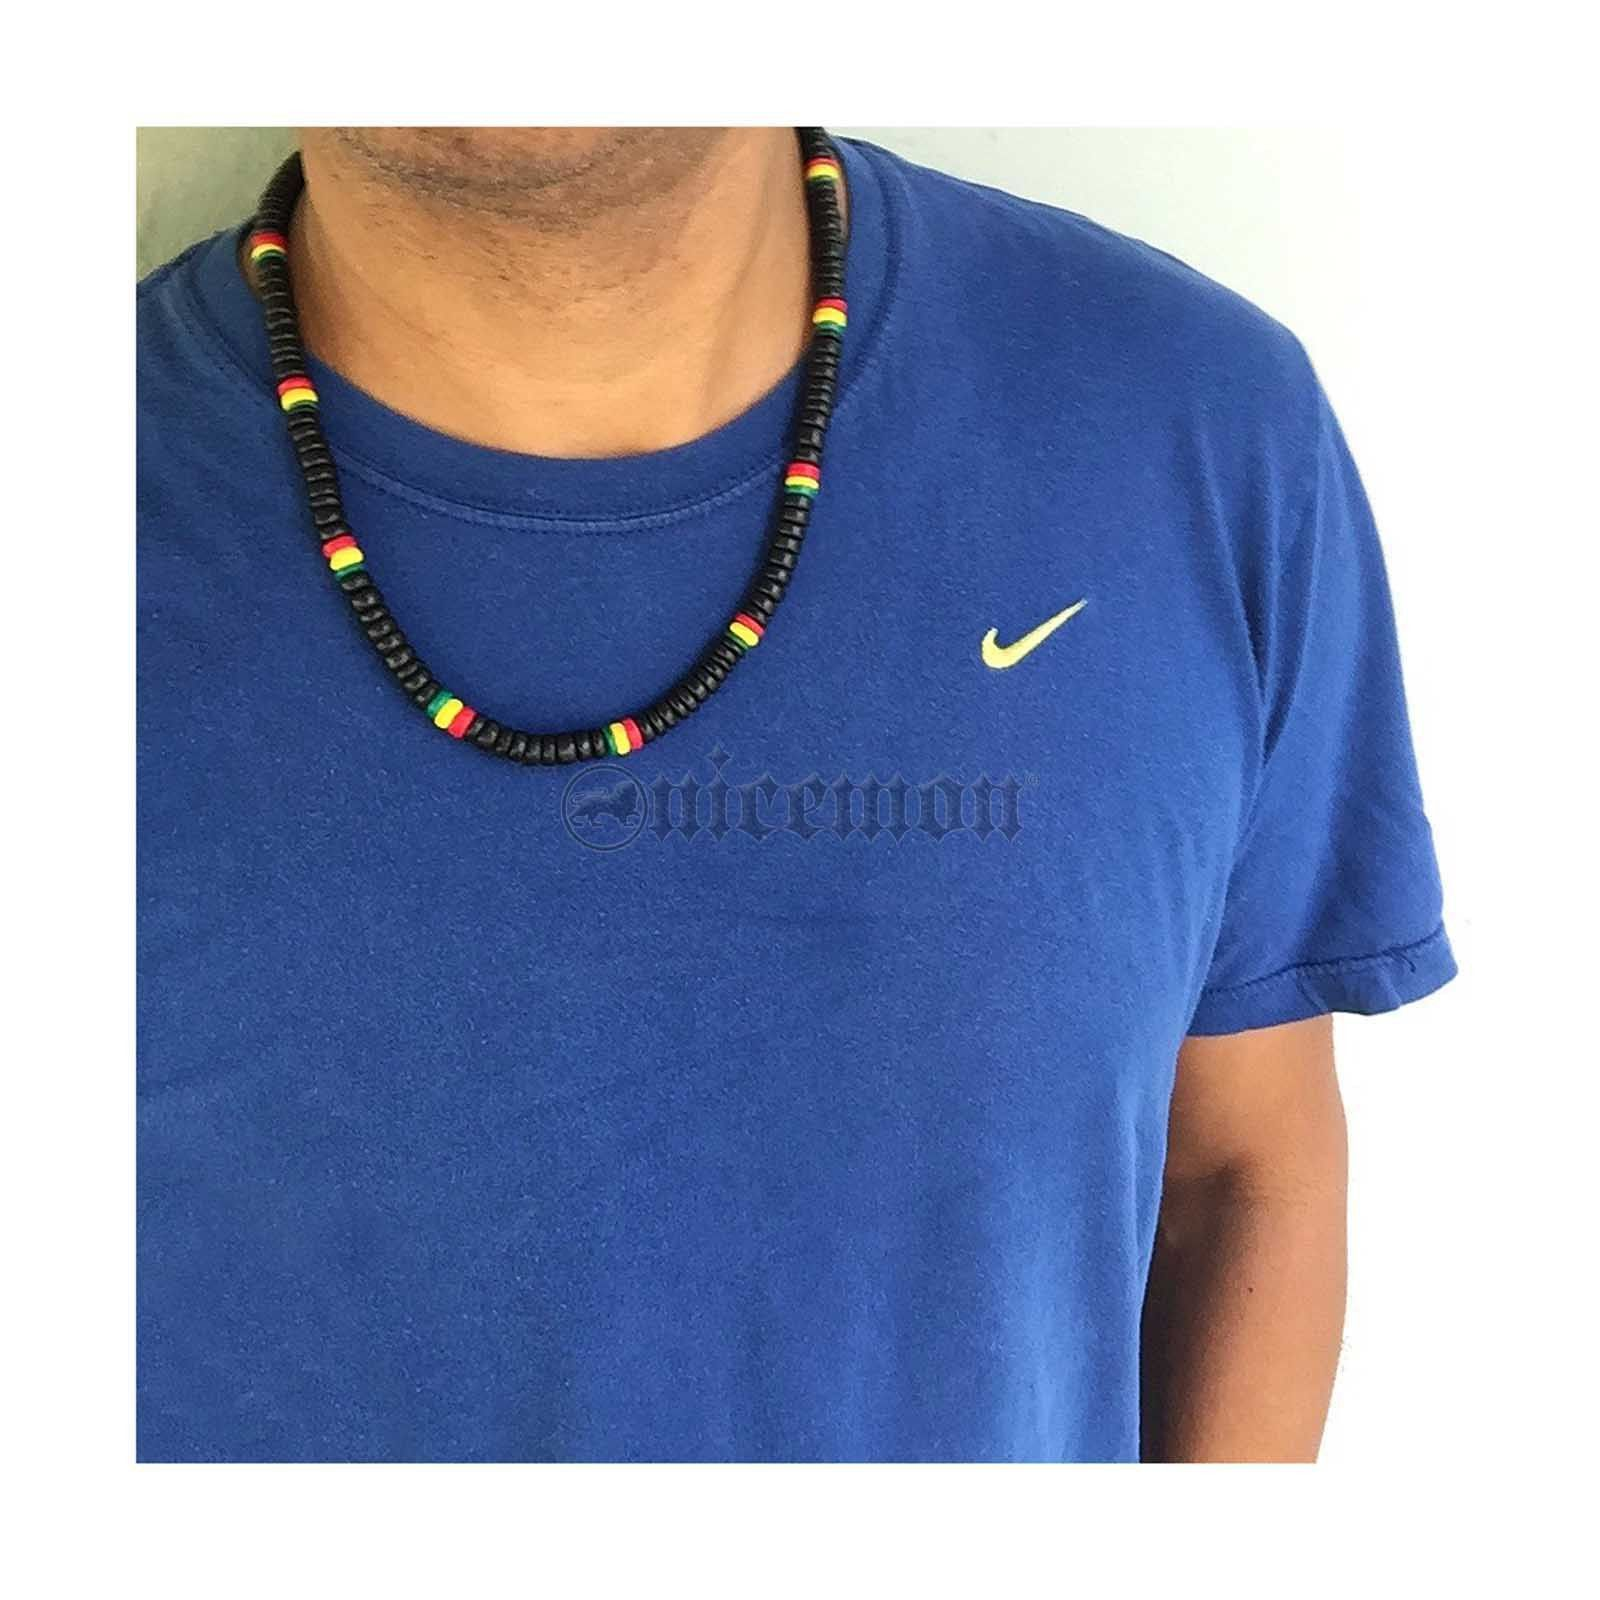 "Rasta Coconut Thick Necklace Coco Beads Rastafari Reggae Jamaica Marley 20/"" 8 mm"